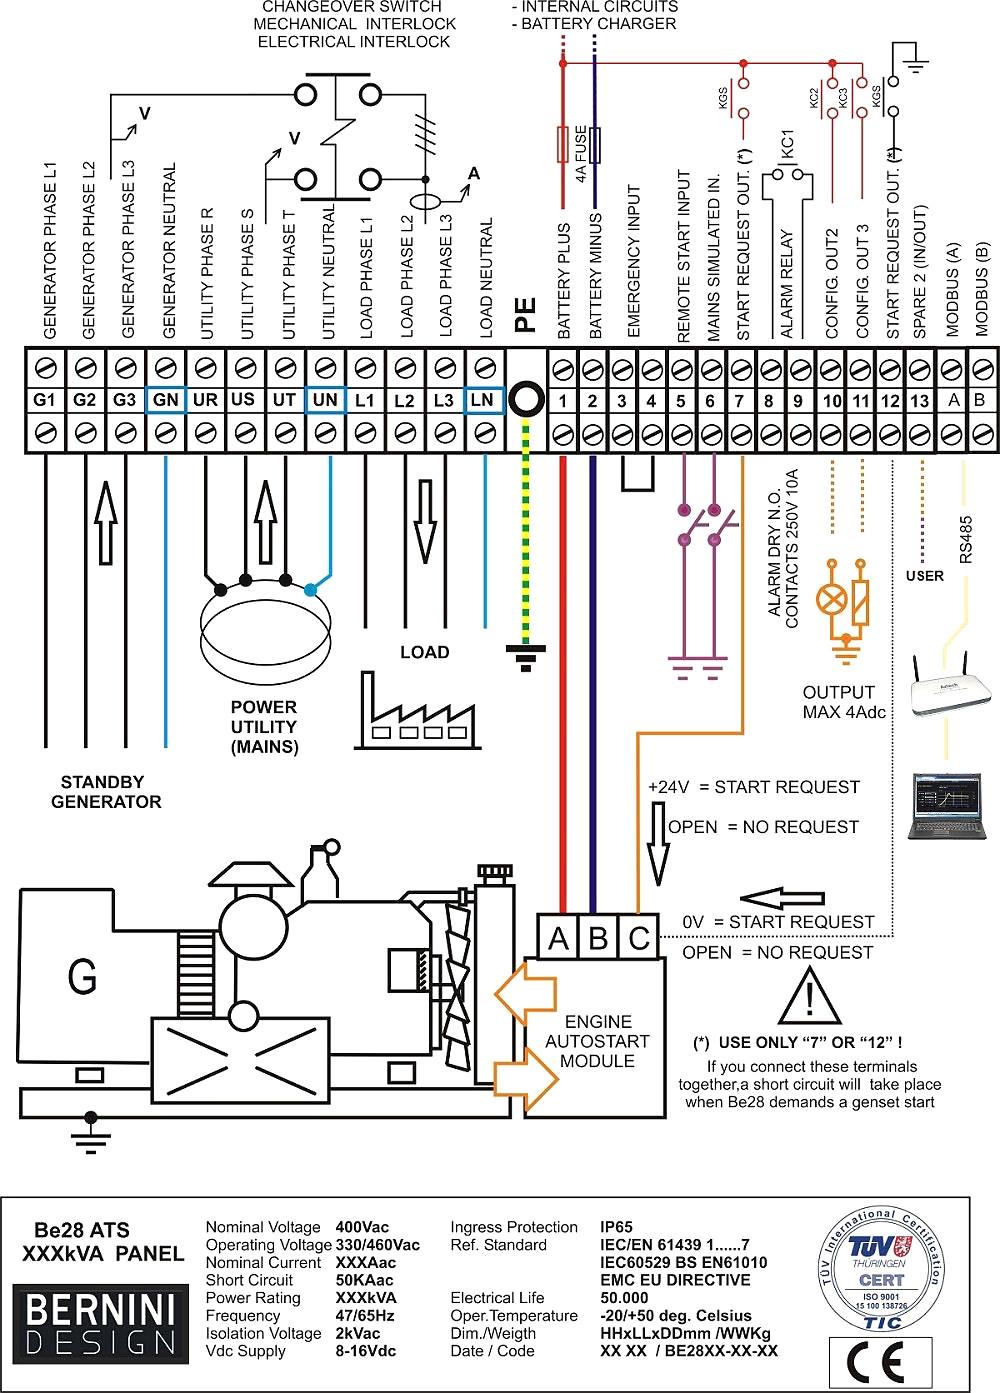 [DIAGRAM_38YU]  WT_1586] Wiring Diagram Starter 6500Gp Generac Schematic Wiring | Wiring Diagram Starter 6500gp Generac |  | Socad Alma Adit Gue45 Mohammedshrine Librar Wiring 101